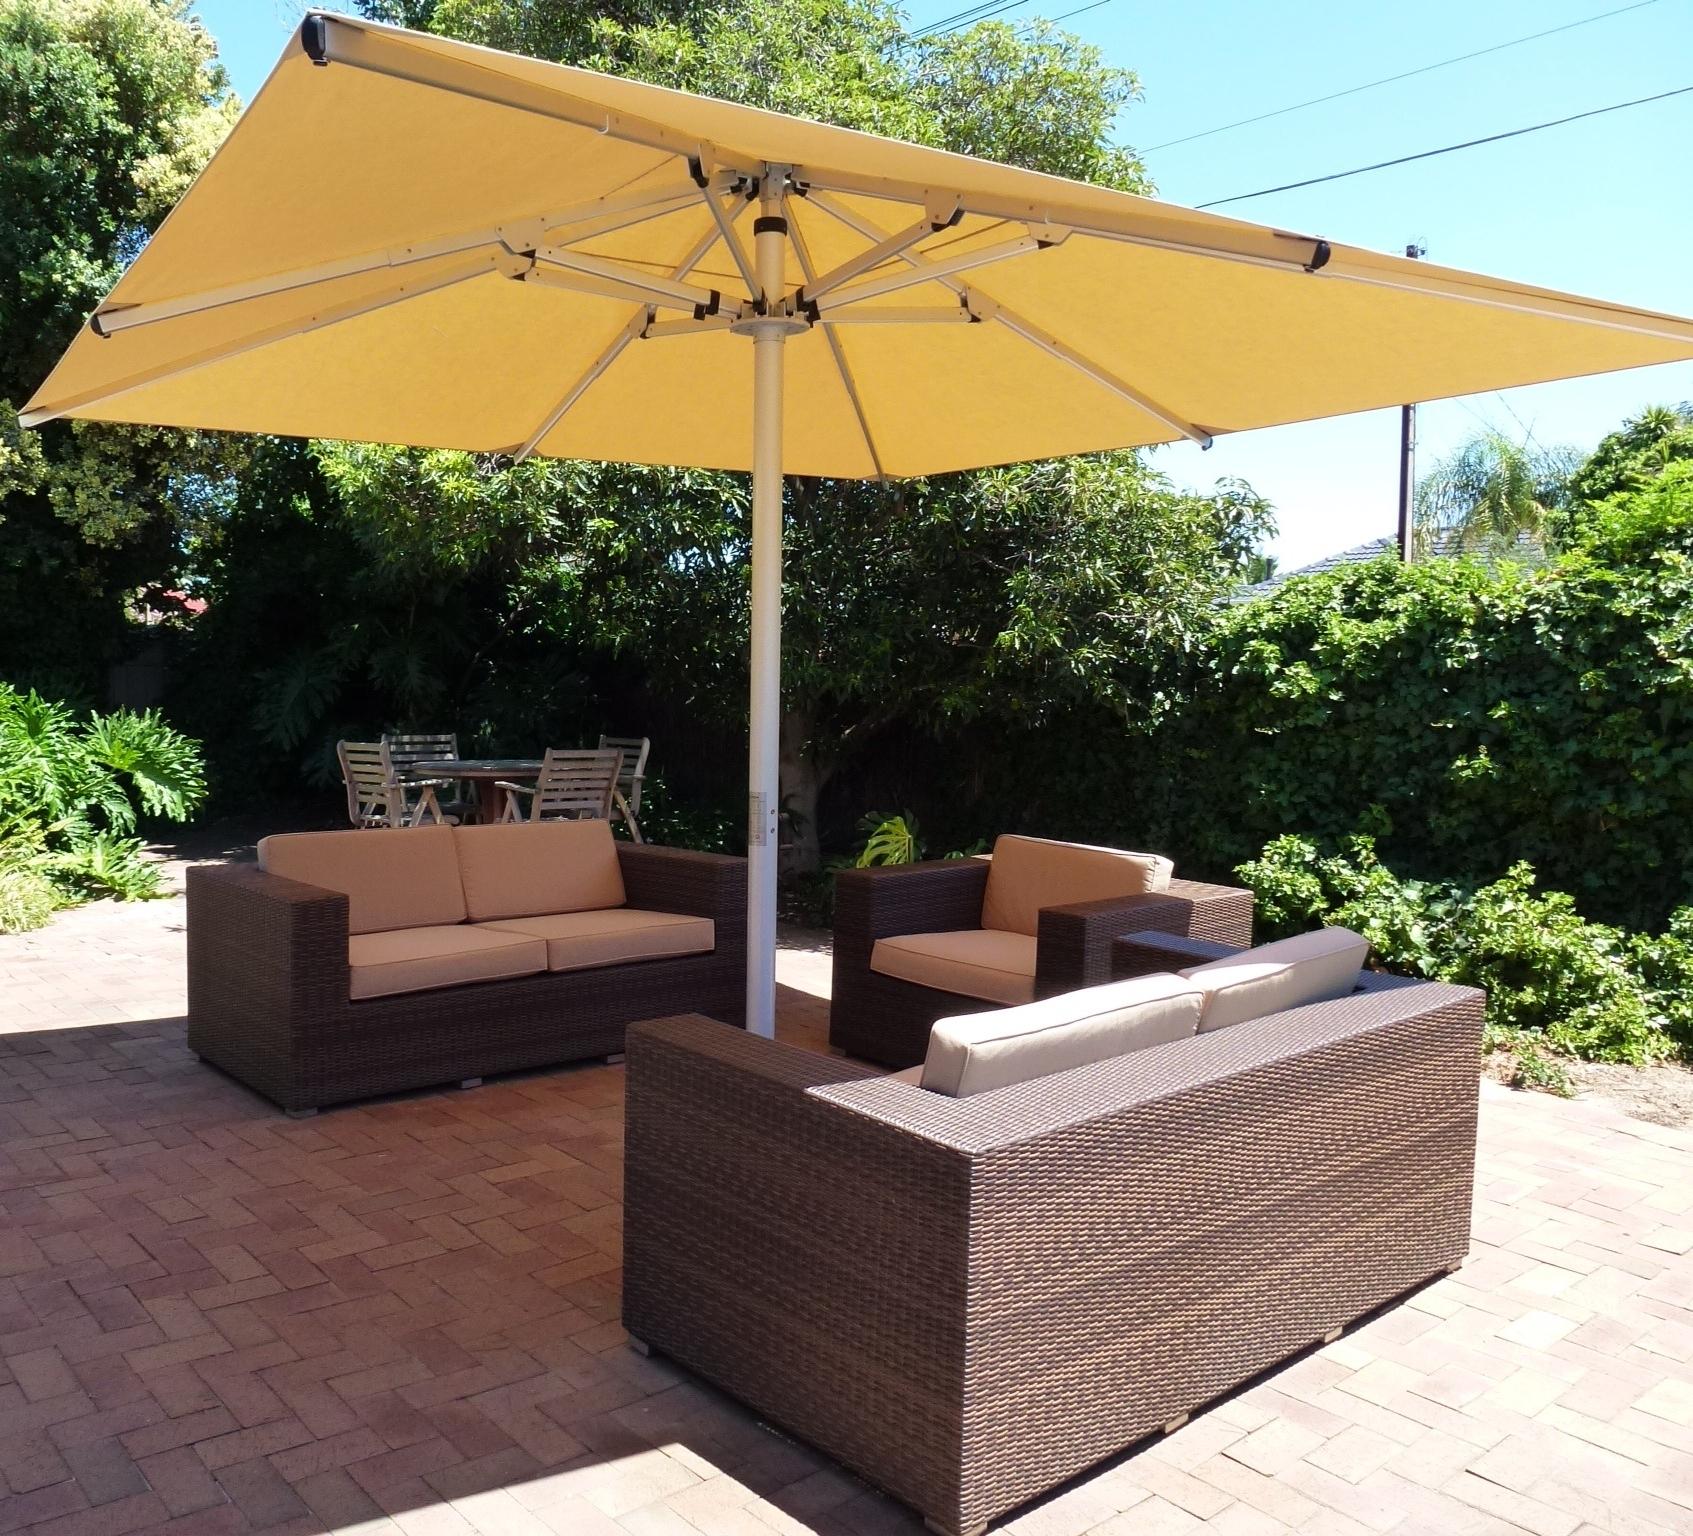 Outdoor Umbrellas For Every With Recent Heavy Duty Patio Umbrellas (View 12 of 20)